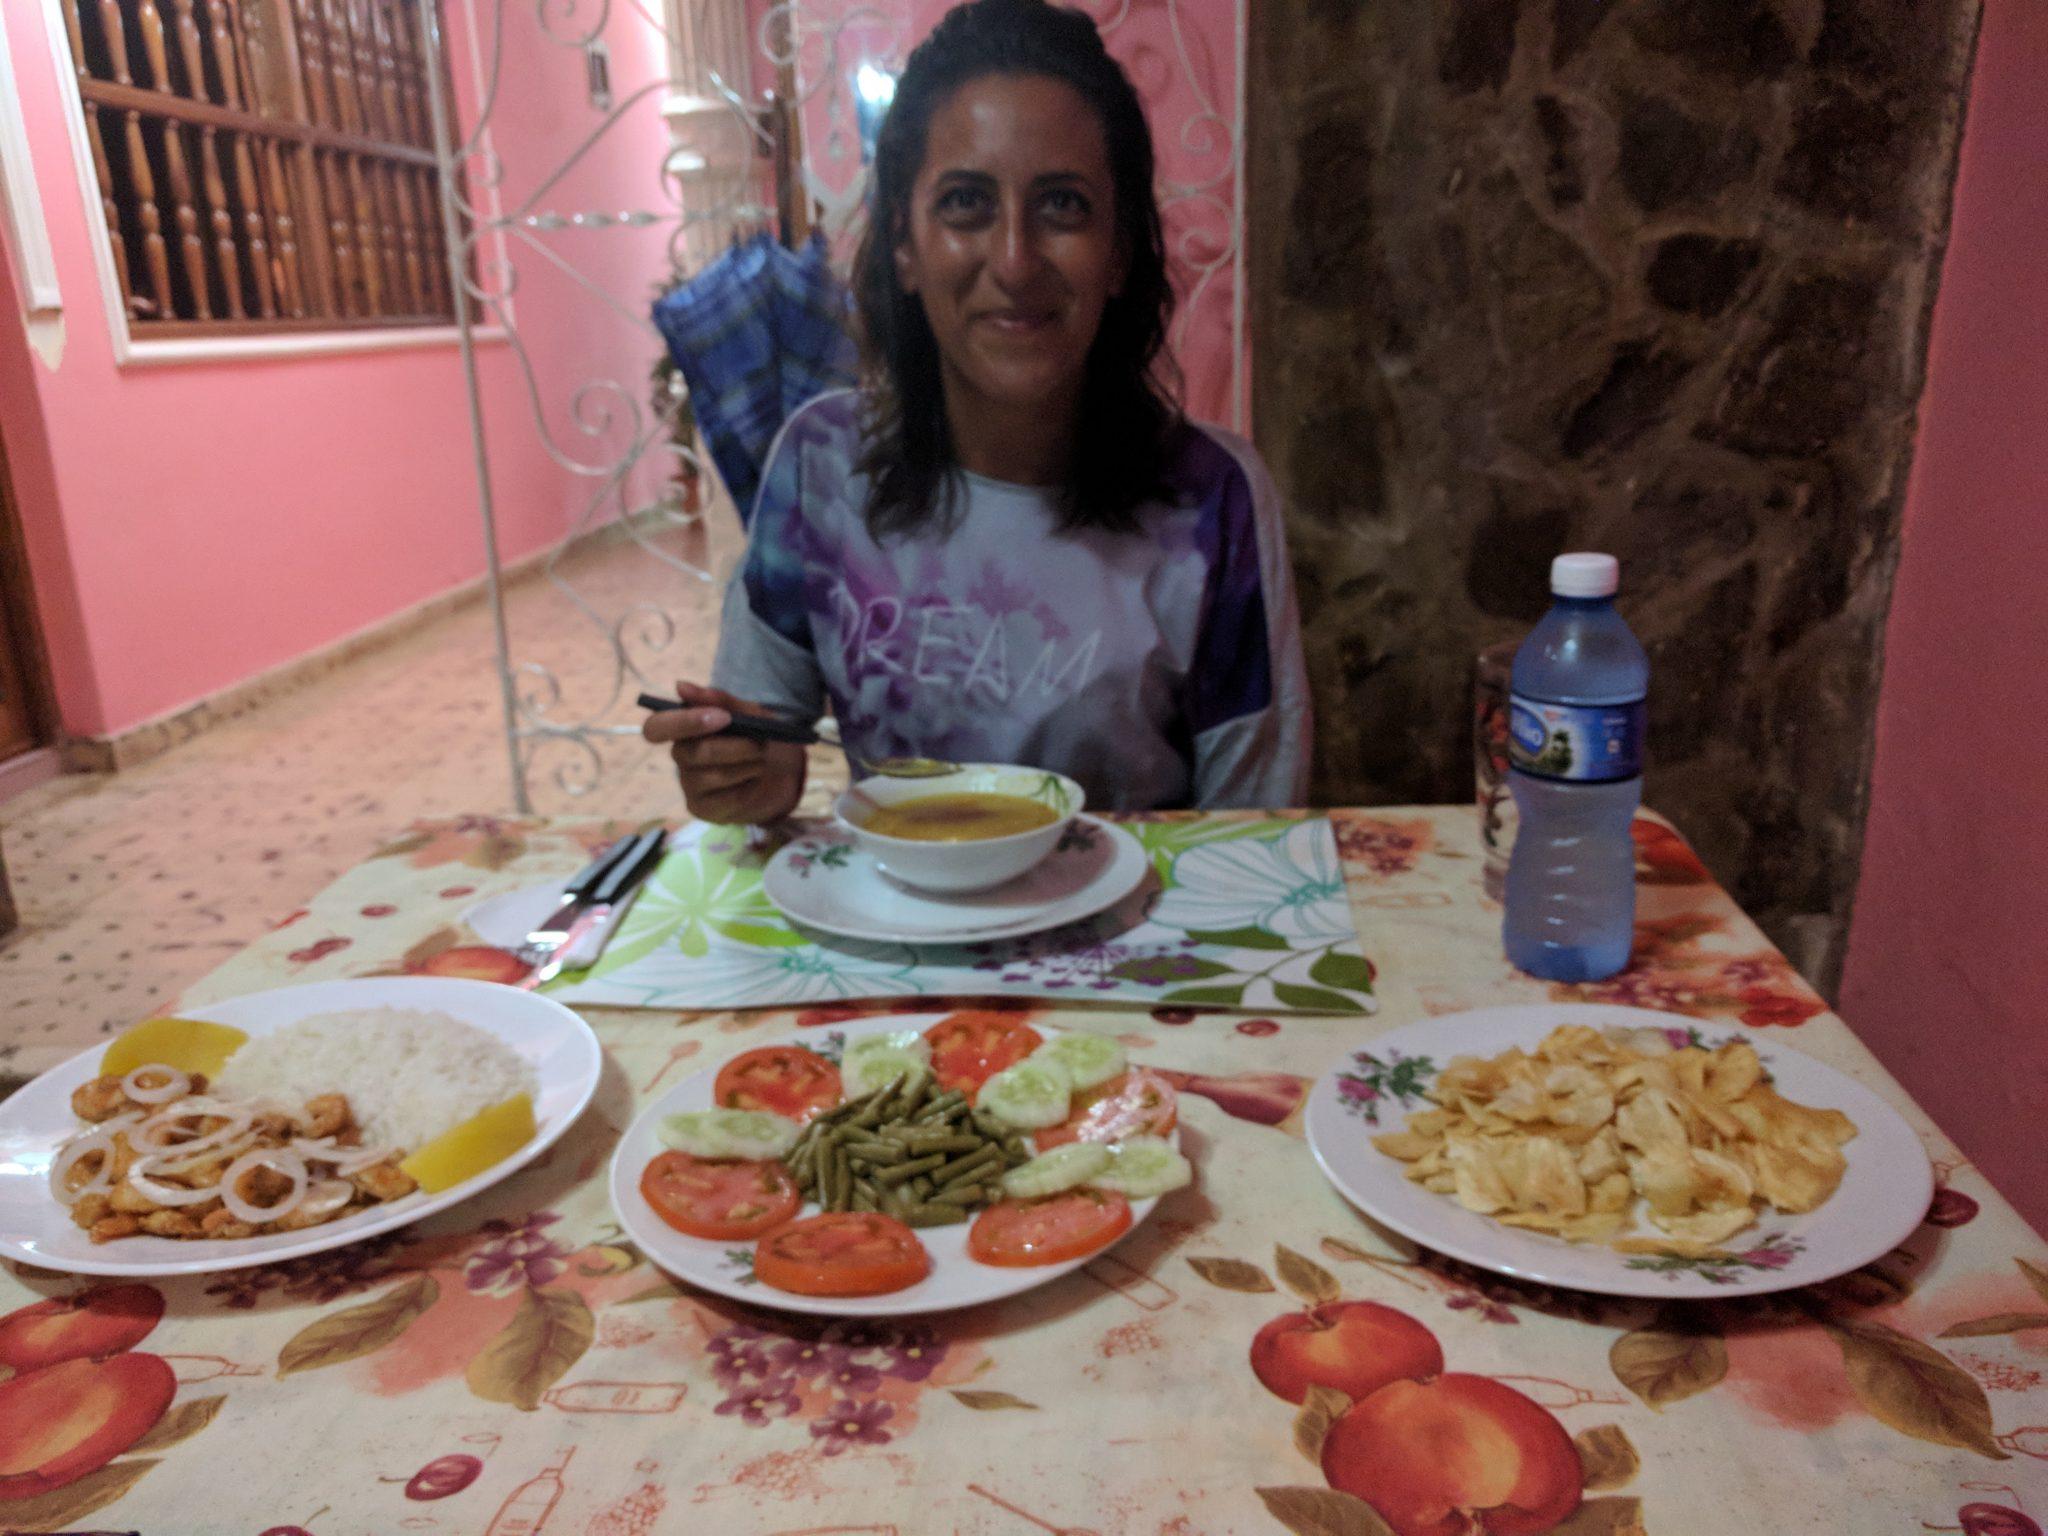 cenare in casa aprticular